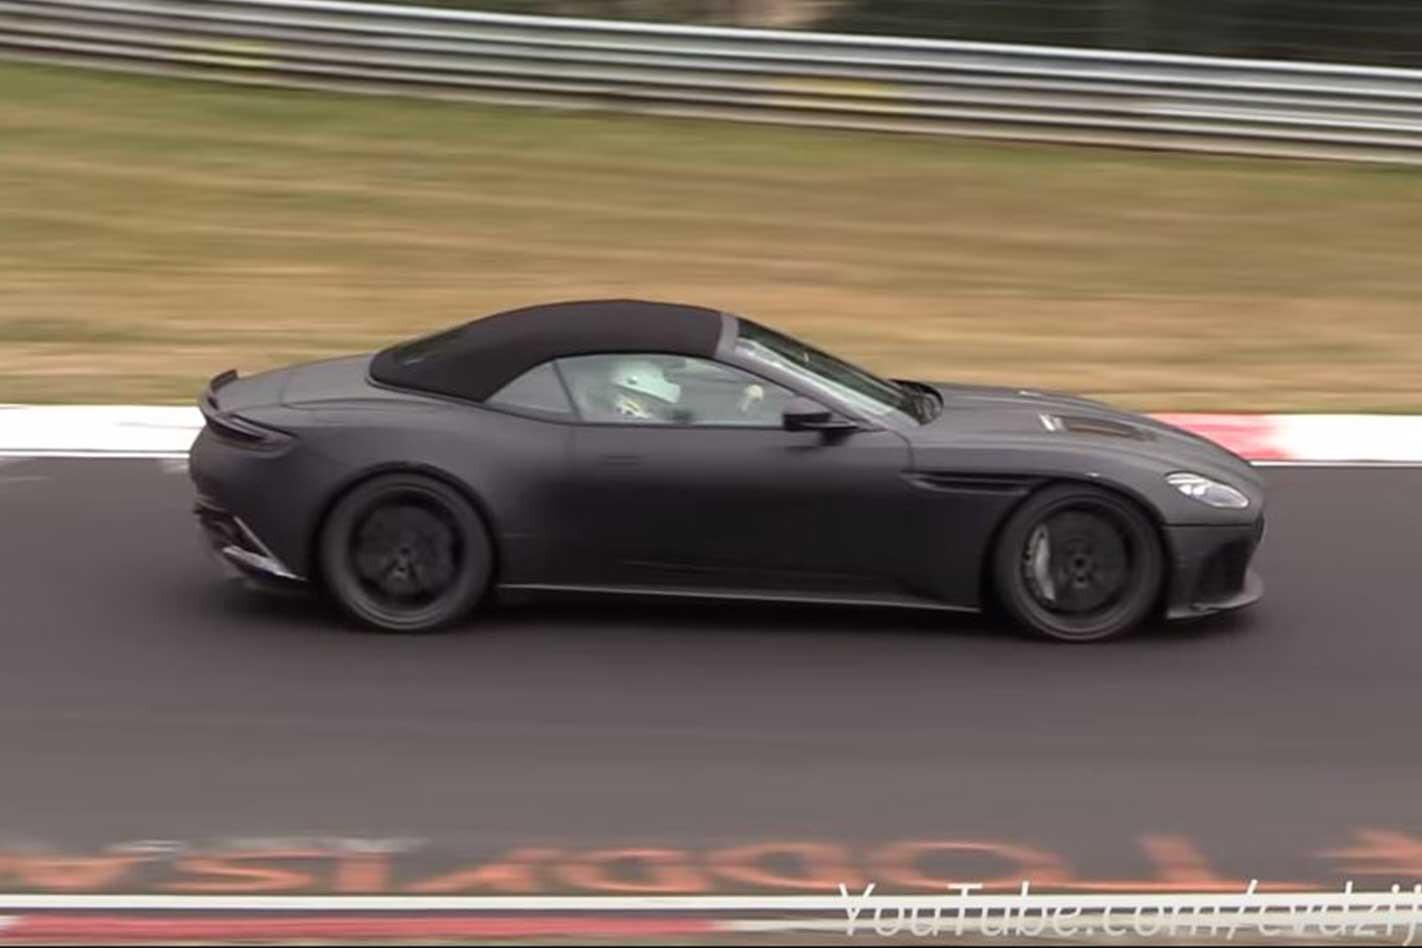 2019 Aston Martin DBS Superleggera Volante Side Profile Jpg